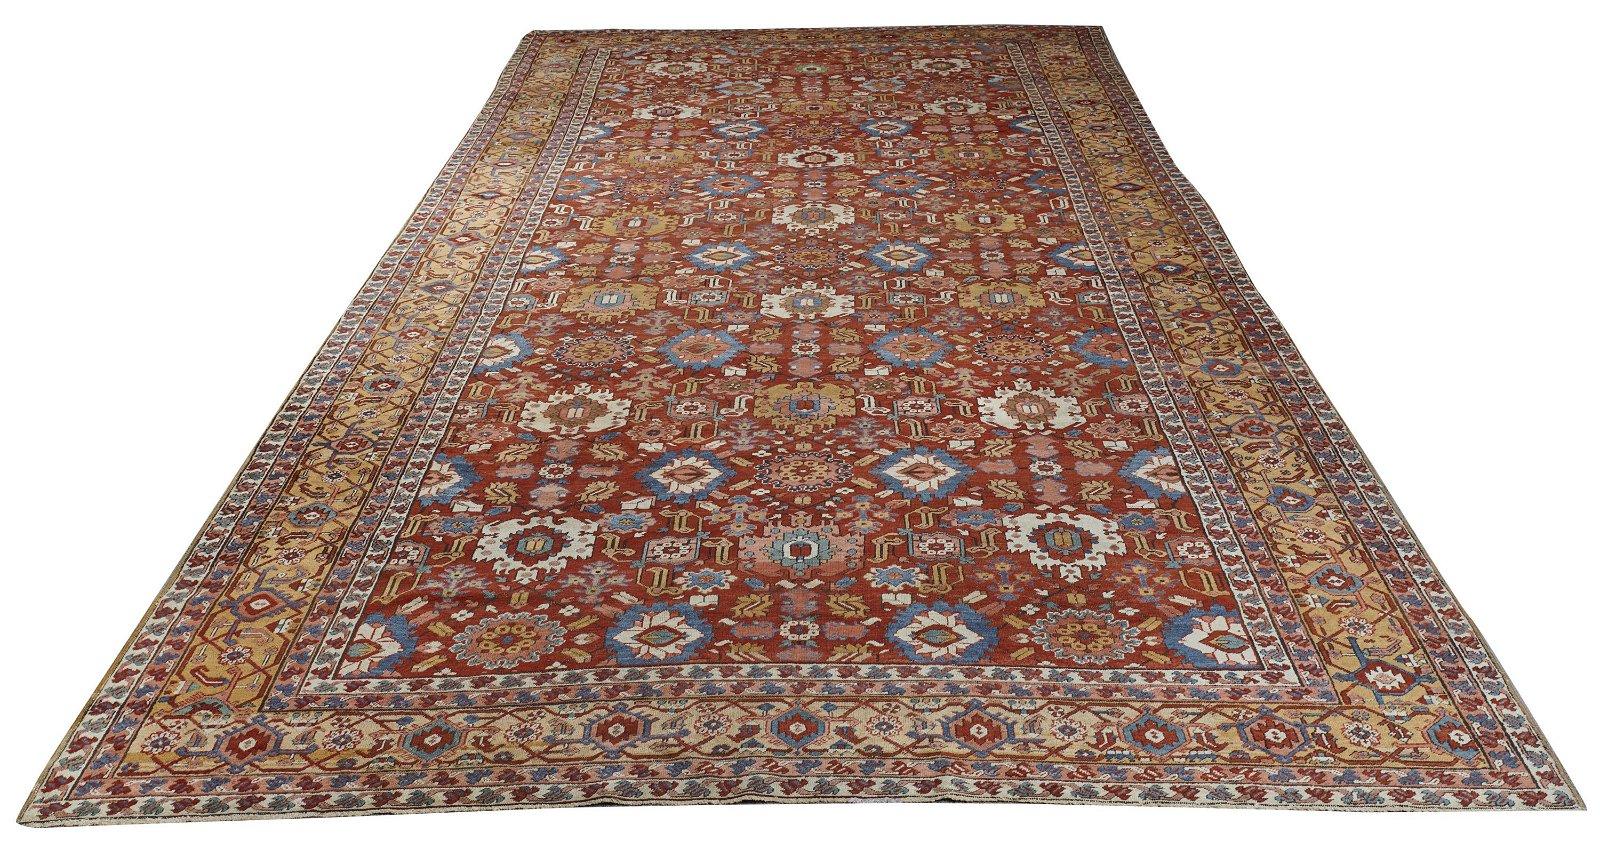 Heriz Carpet, Persia, ca. 1900; 21 ft. 11 in. x 11 ft.